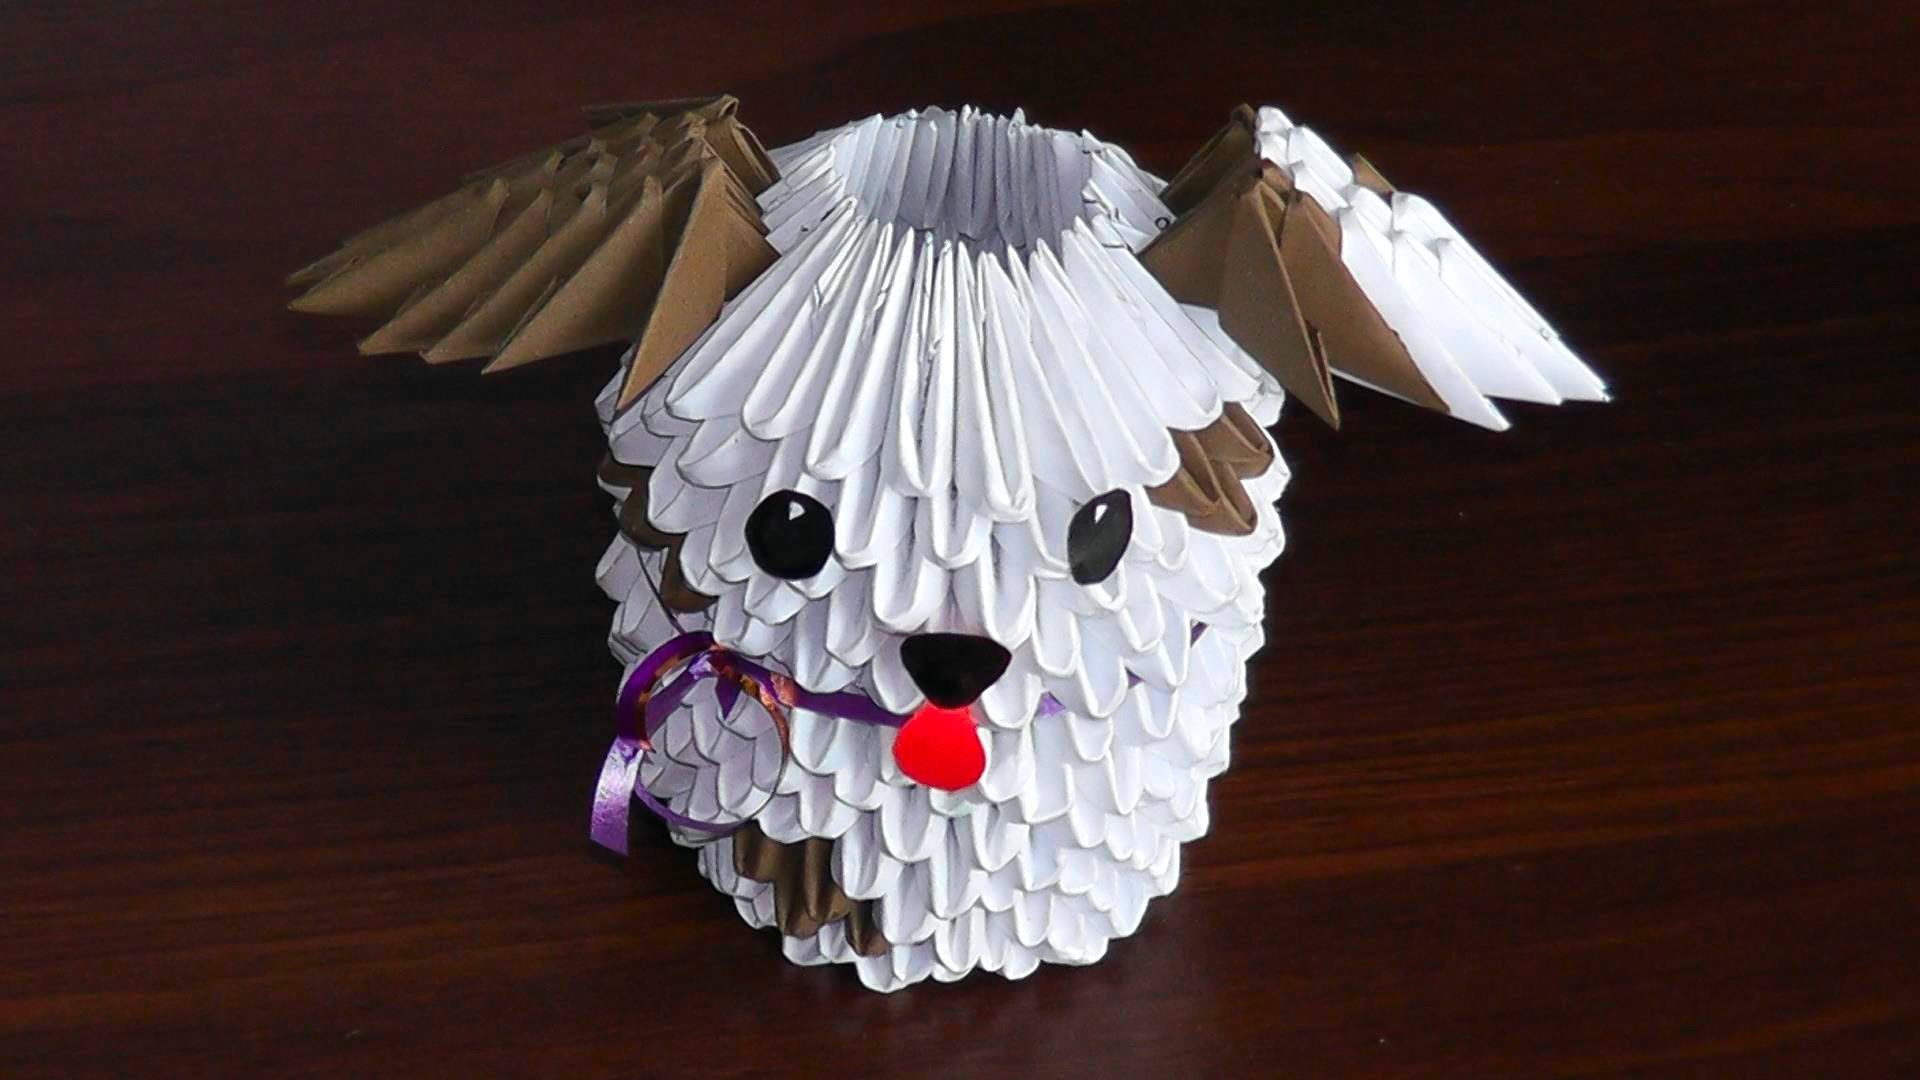 Модульное оригами собака (собачка, щенок) схема сборки * Origami * Pinterest Щенок, Оригами и Собаки